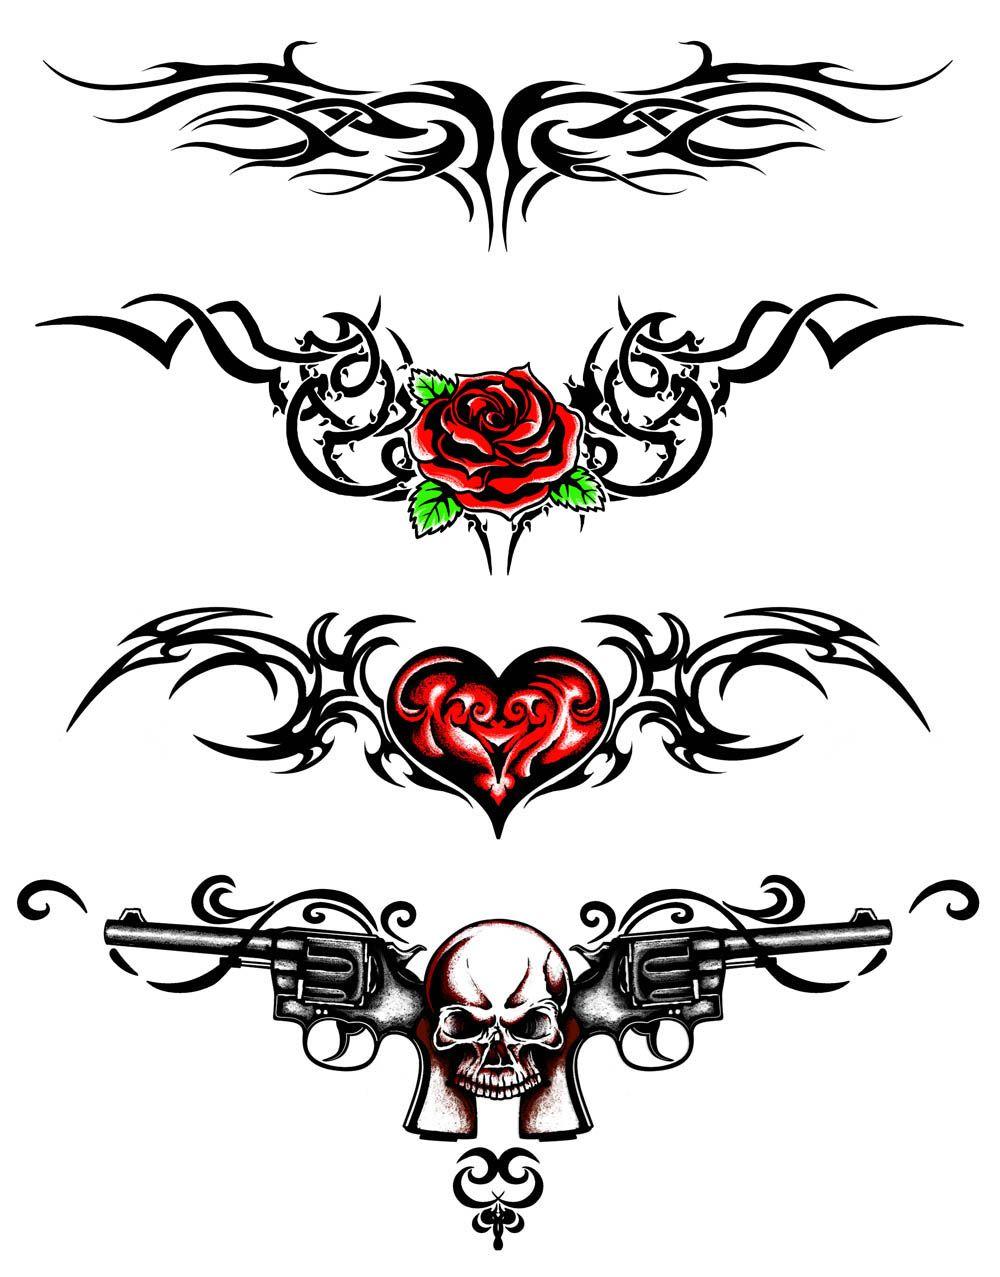 Pinterest Lollipopornstar Lower Back Tattoos Back Tattoos Lower Back Tattoos Back Tattoo Women Spine